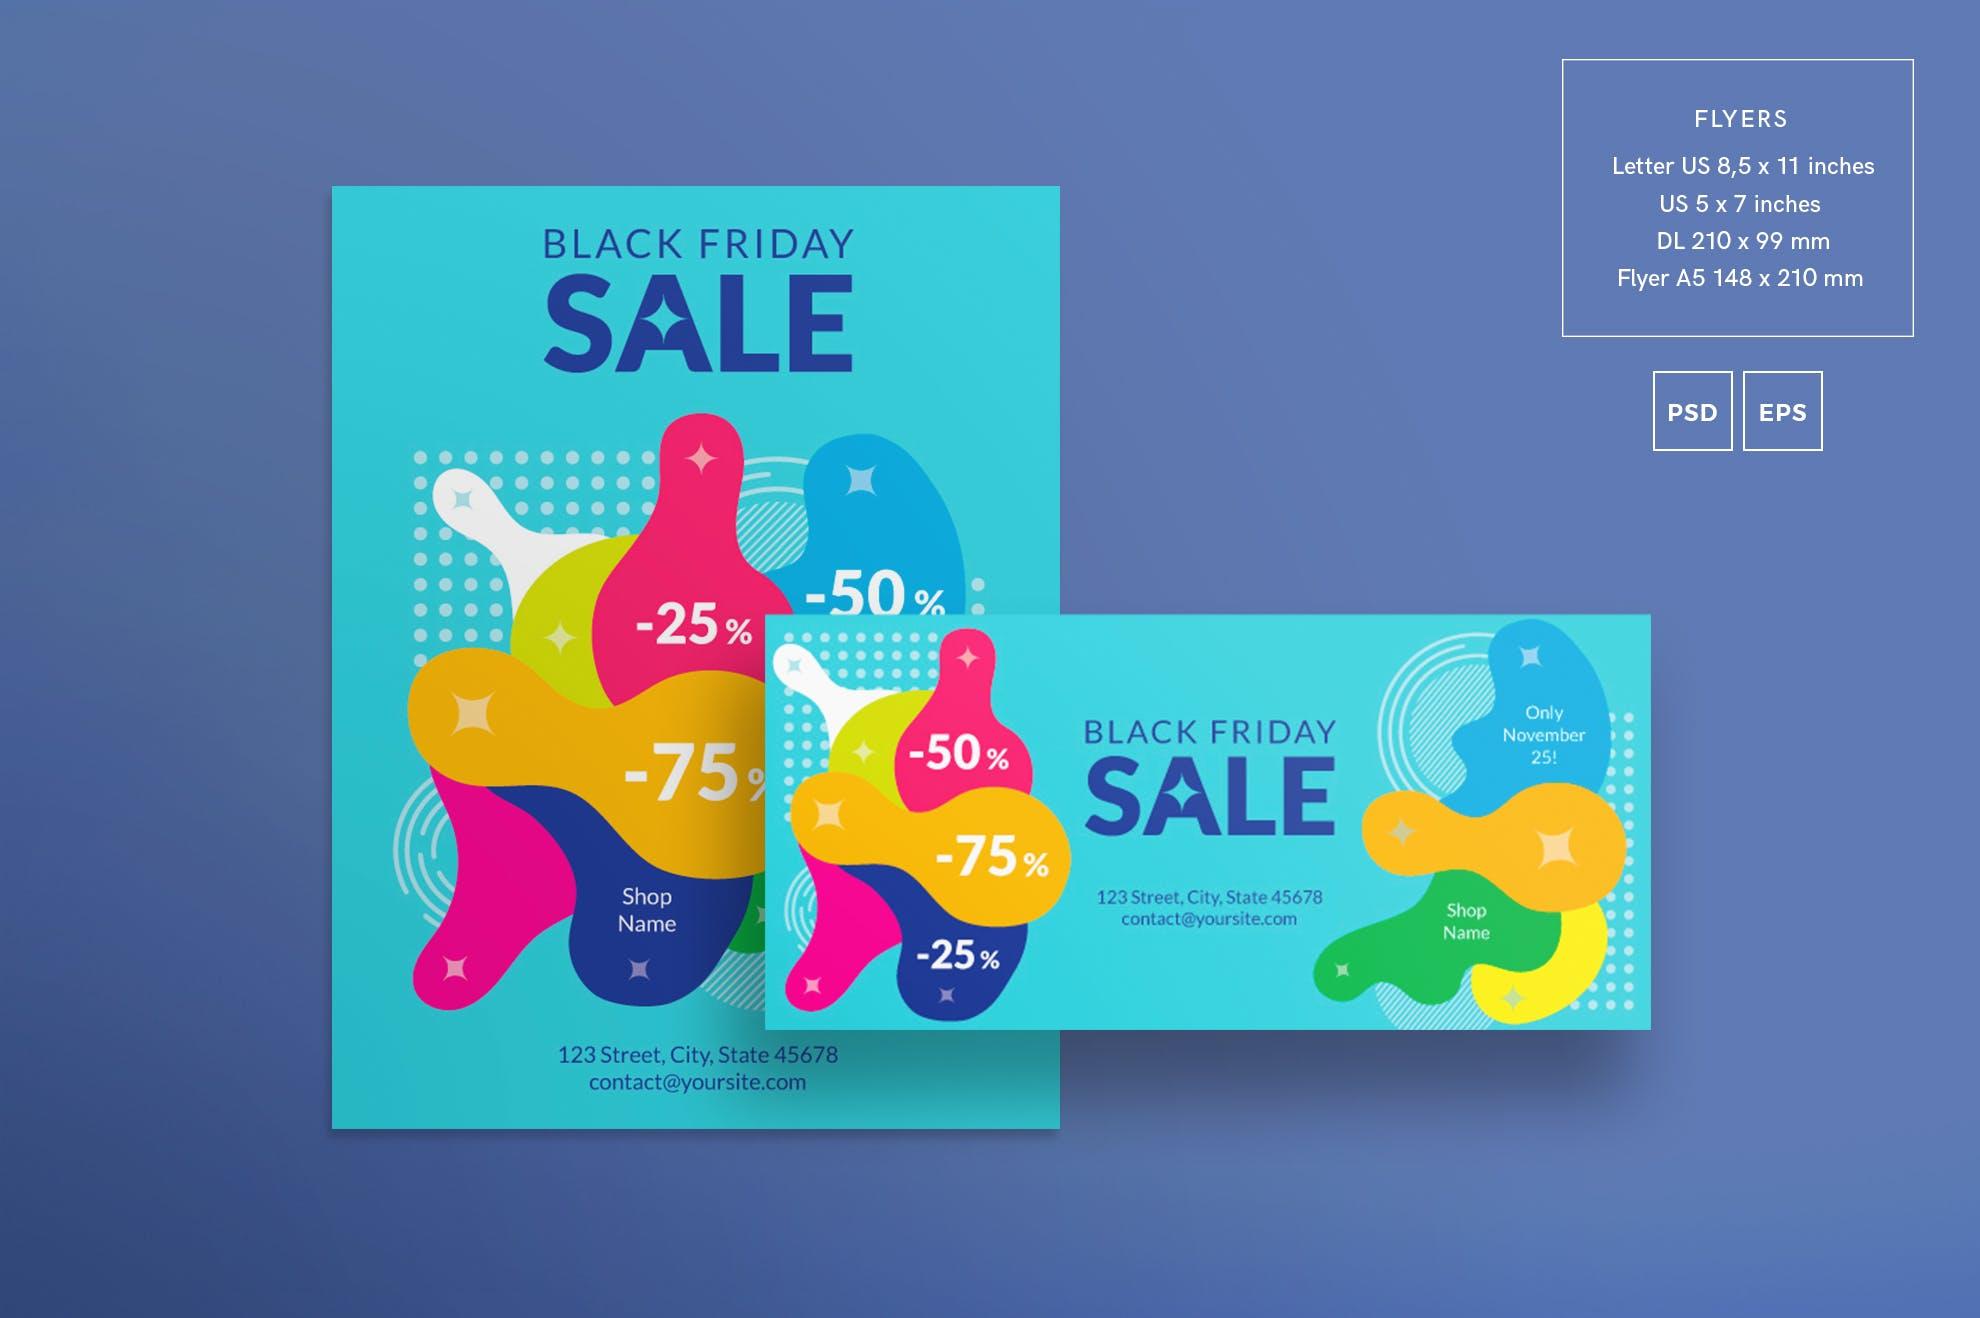 黑色星期五销售传单和海报模板Black Friday Sale Flyer and Poster Template 292pb4